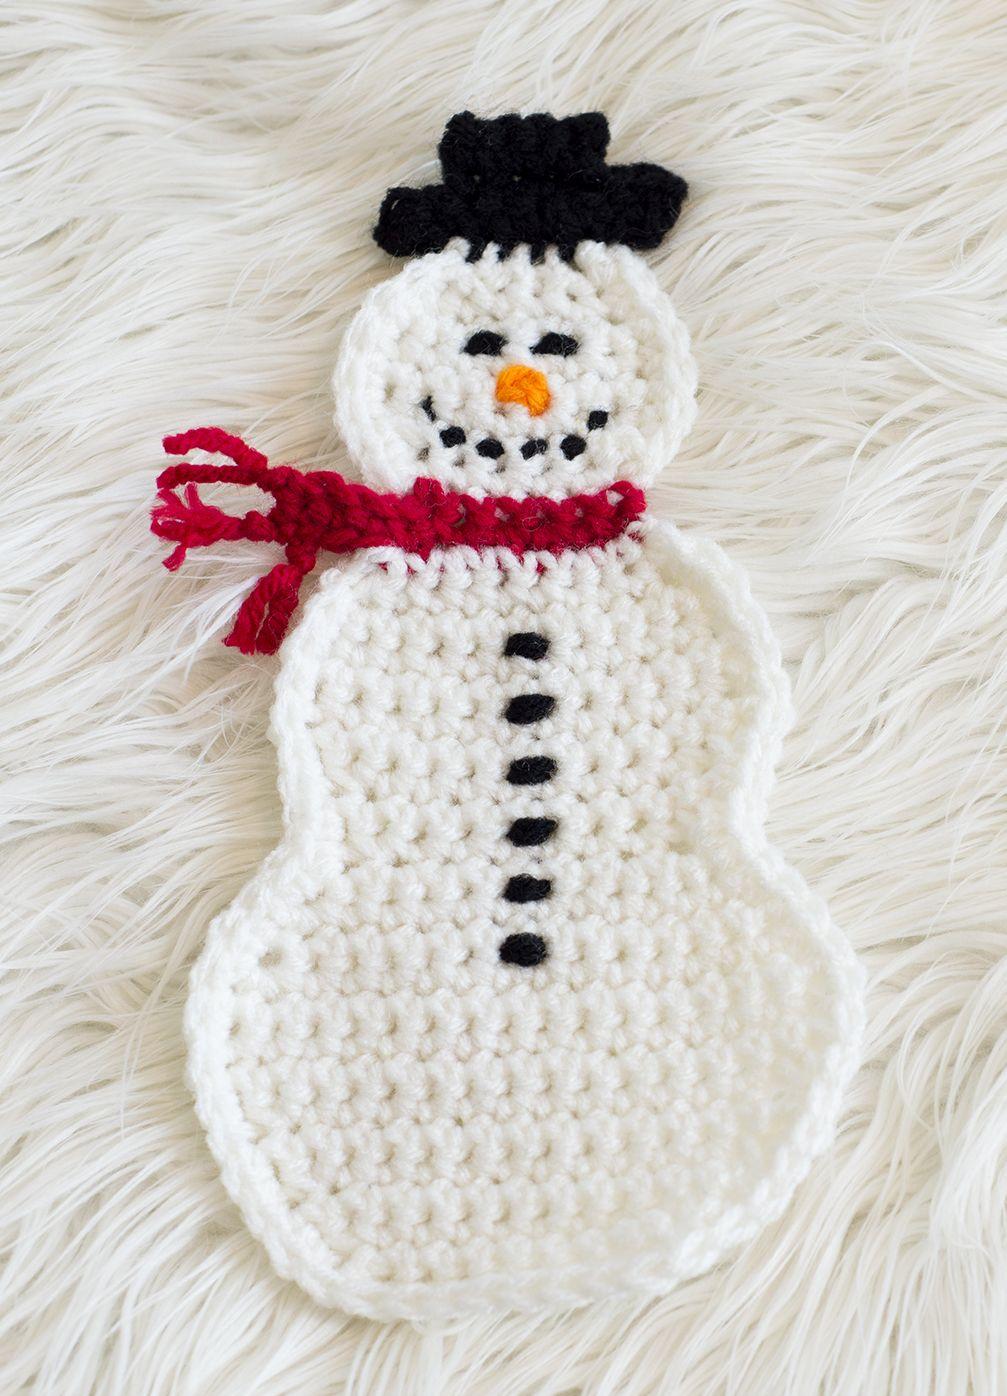 Snowman pot holder free pattern knit crochet crochet 6 snowman pot holder free pattern knit crochet bankloansurffo Choice Image